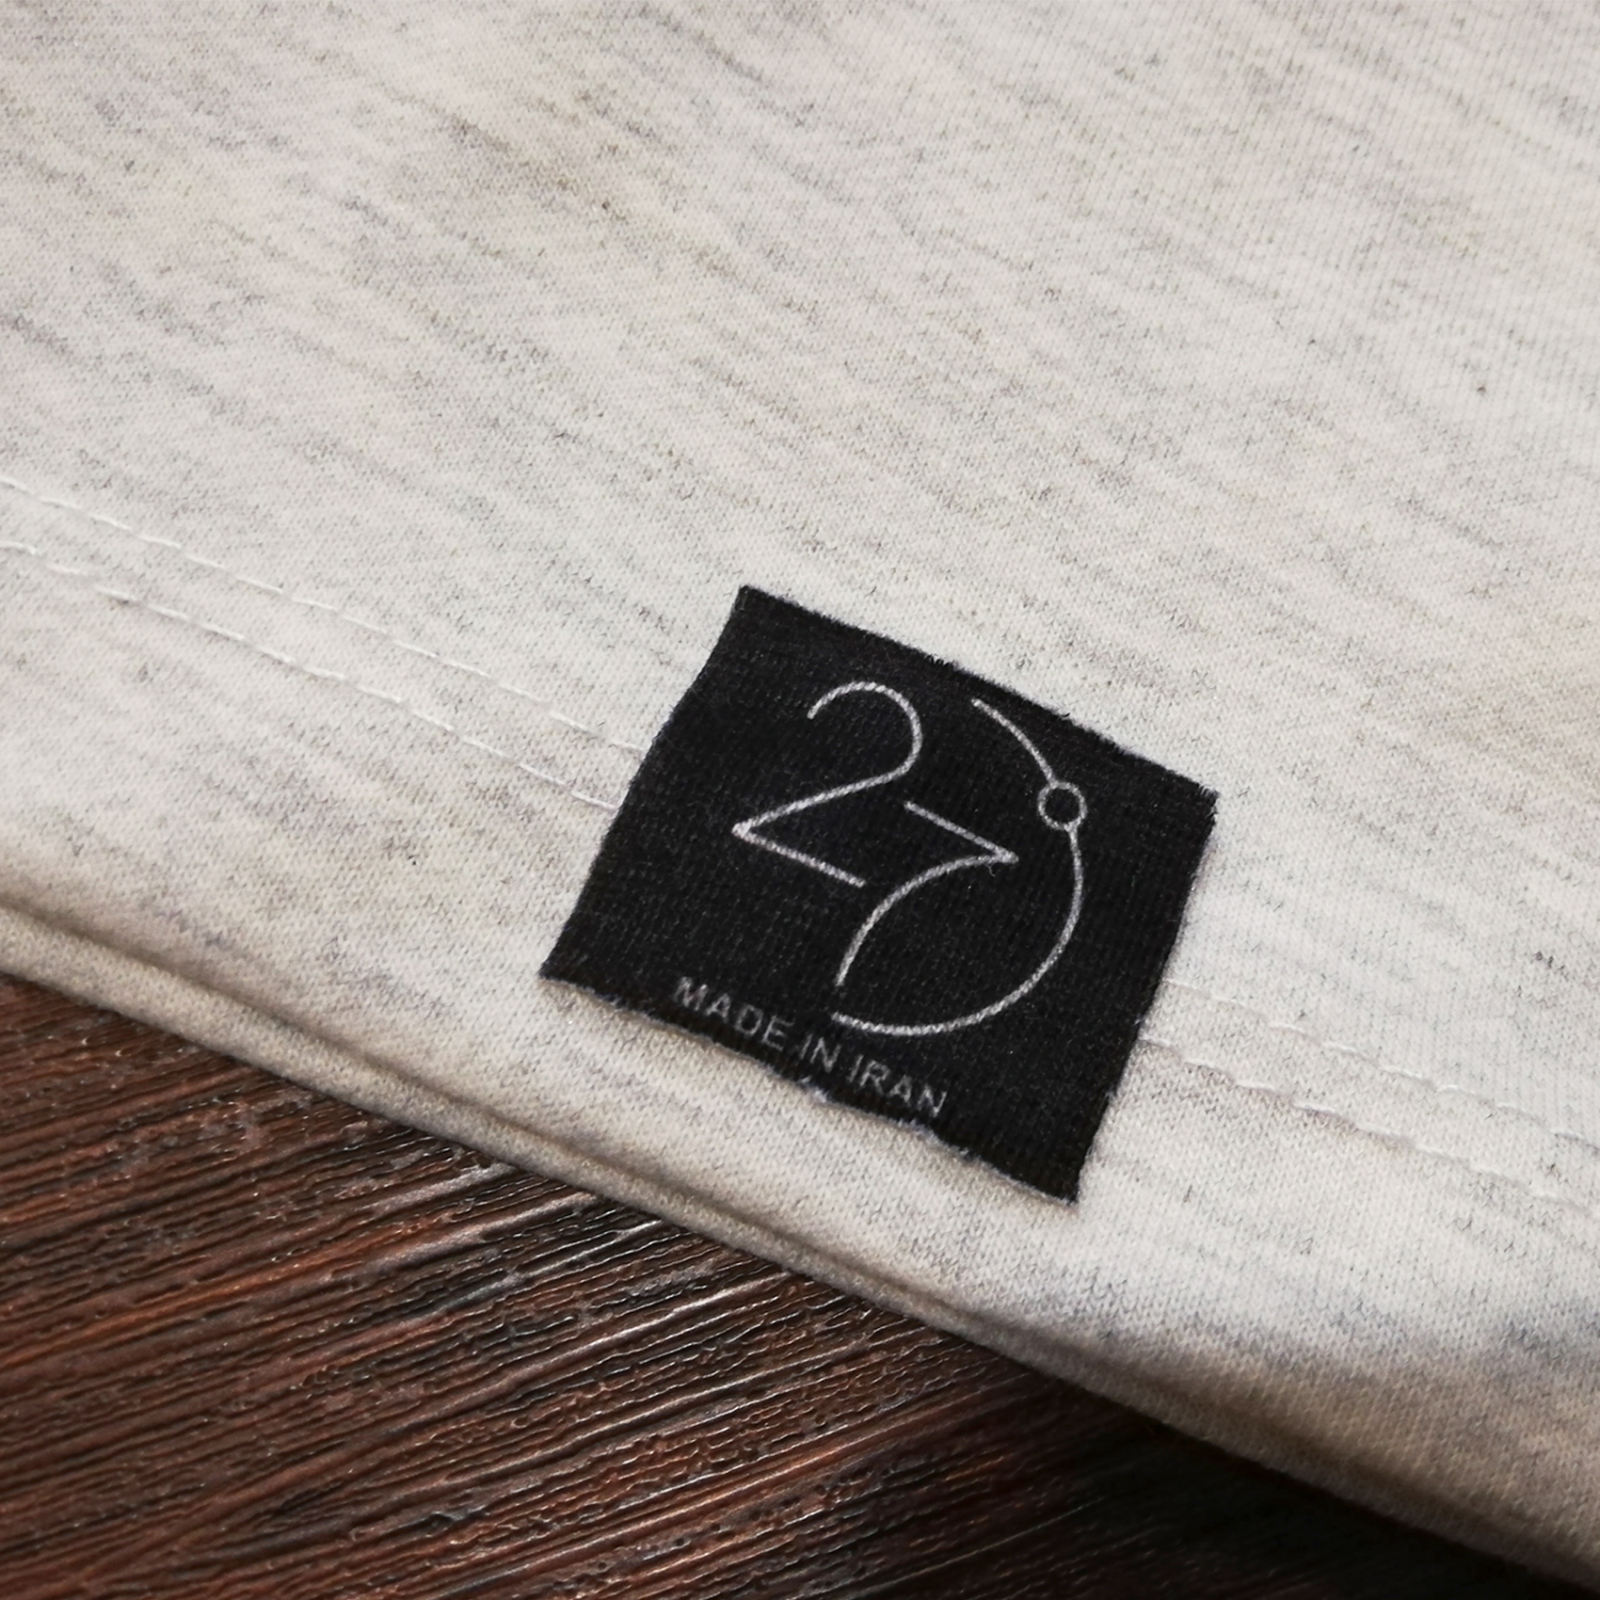 تیشرت مردانه 27 طرح جوکر کد H15 -  - 4